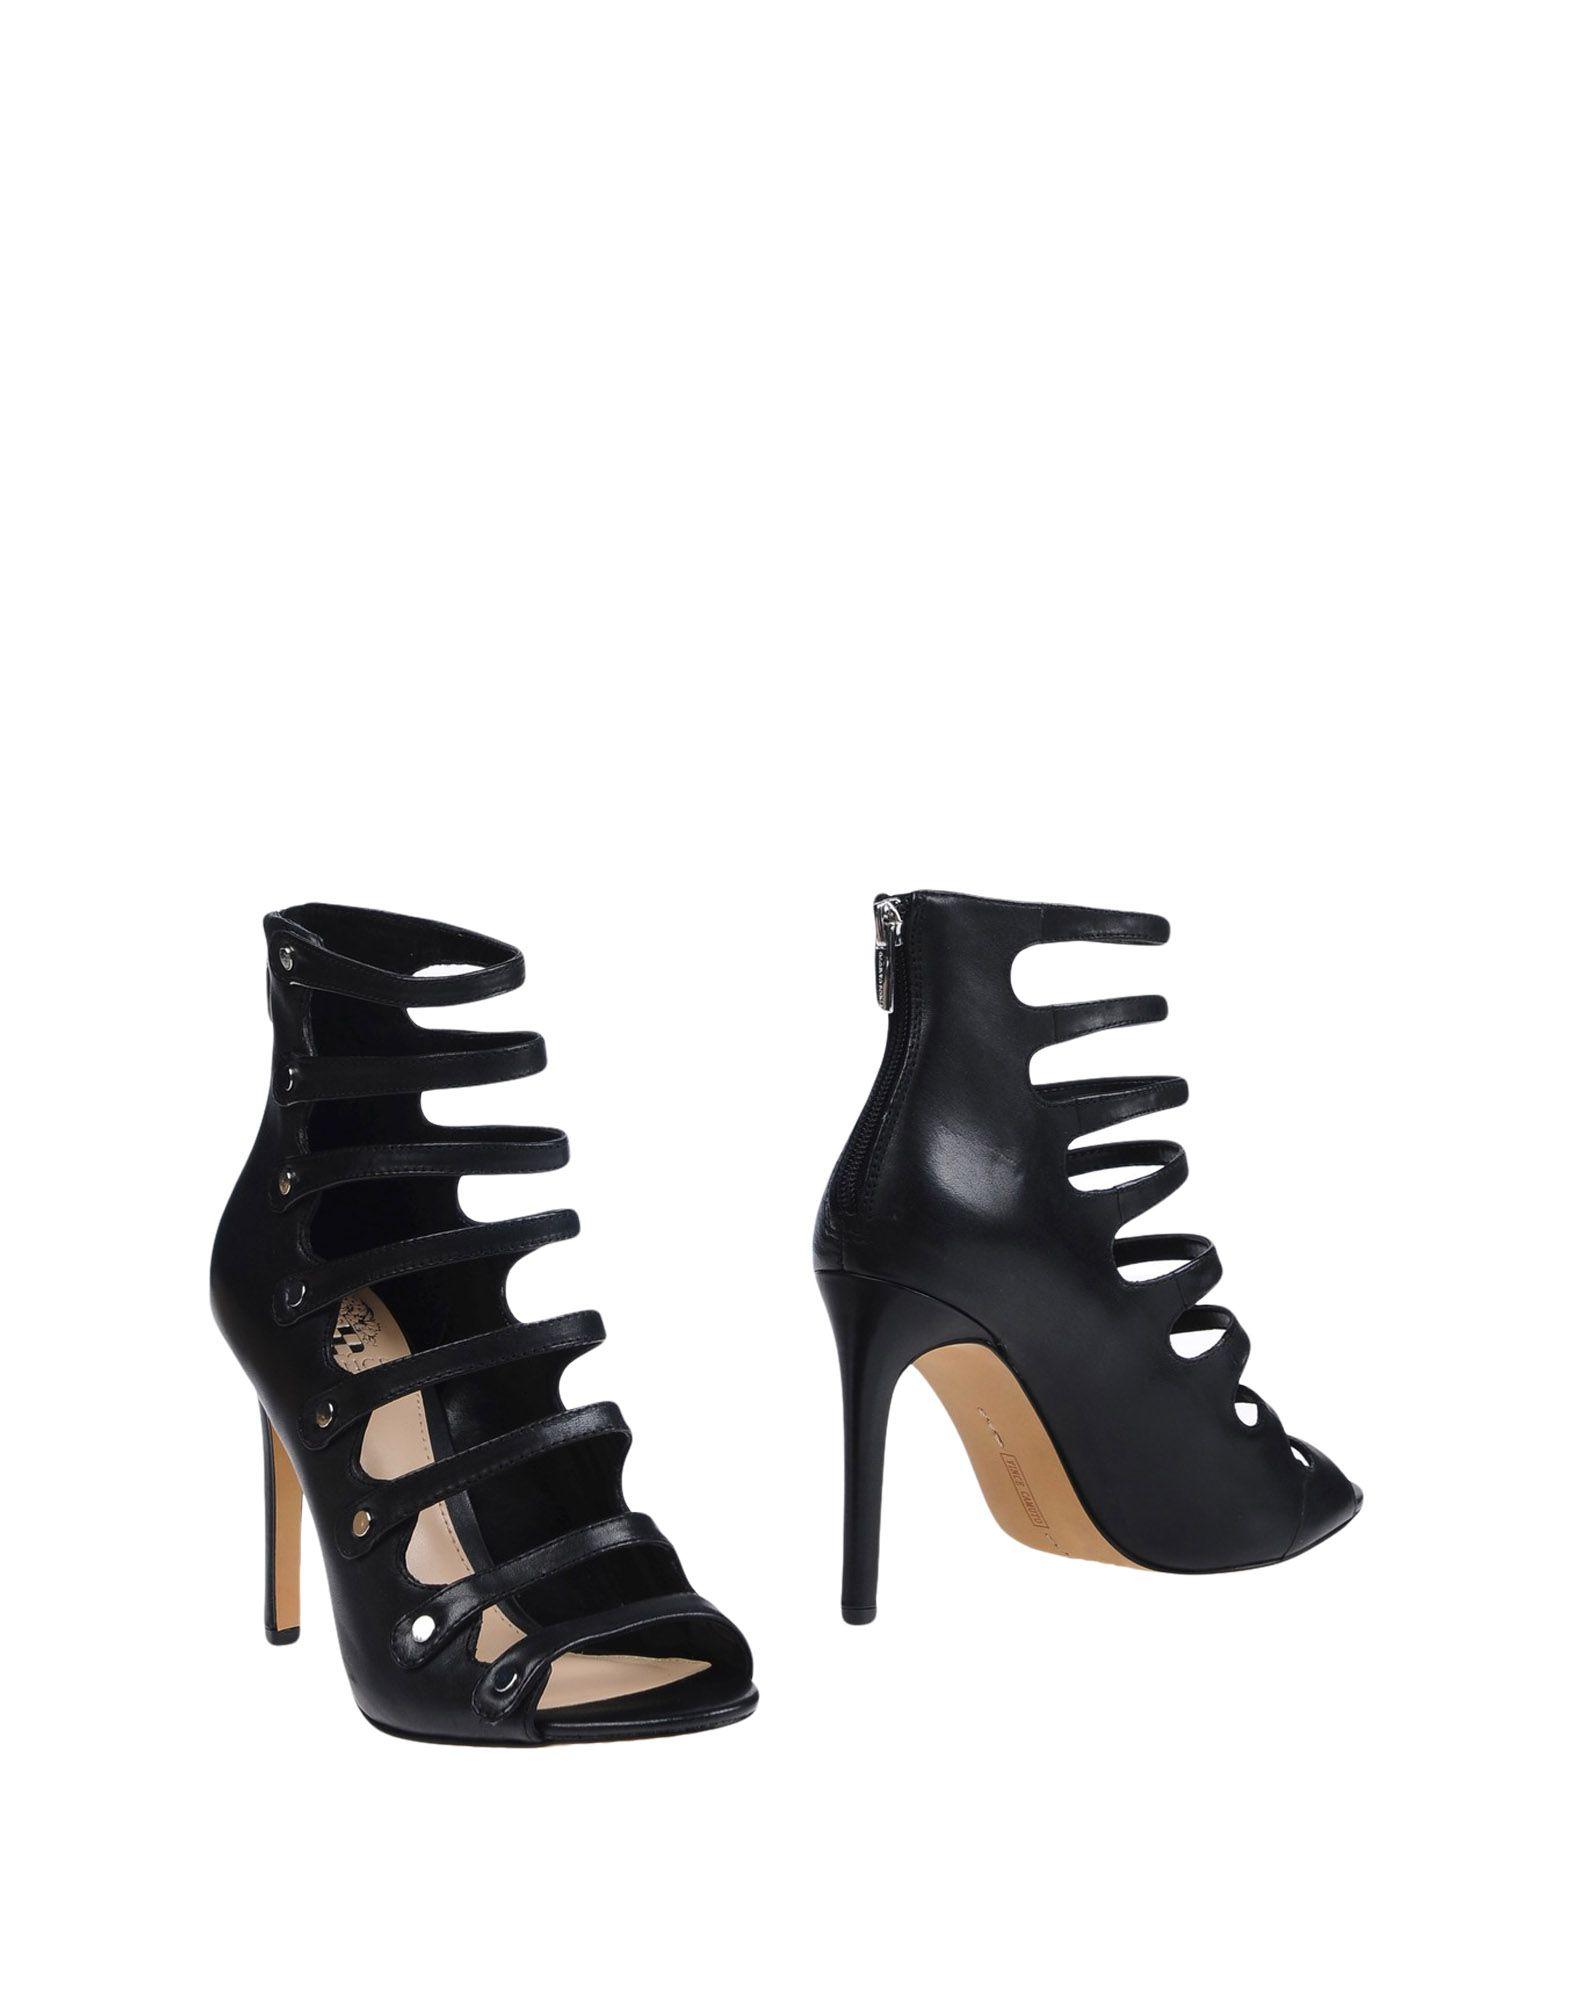 Gut Camuto um billige Schuhe zu tragenVince Camuto Gut Sandalen Damen  11253151HB 8a6177